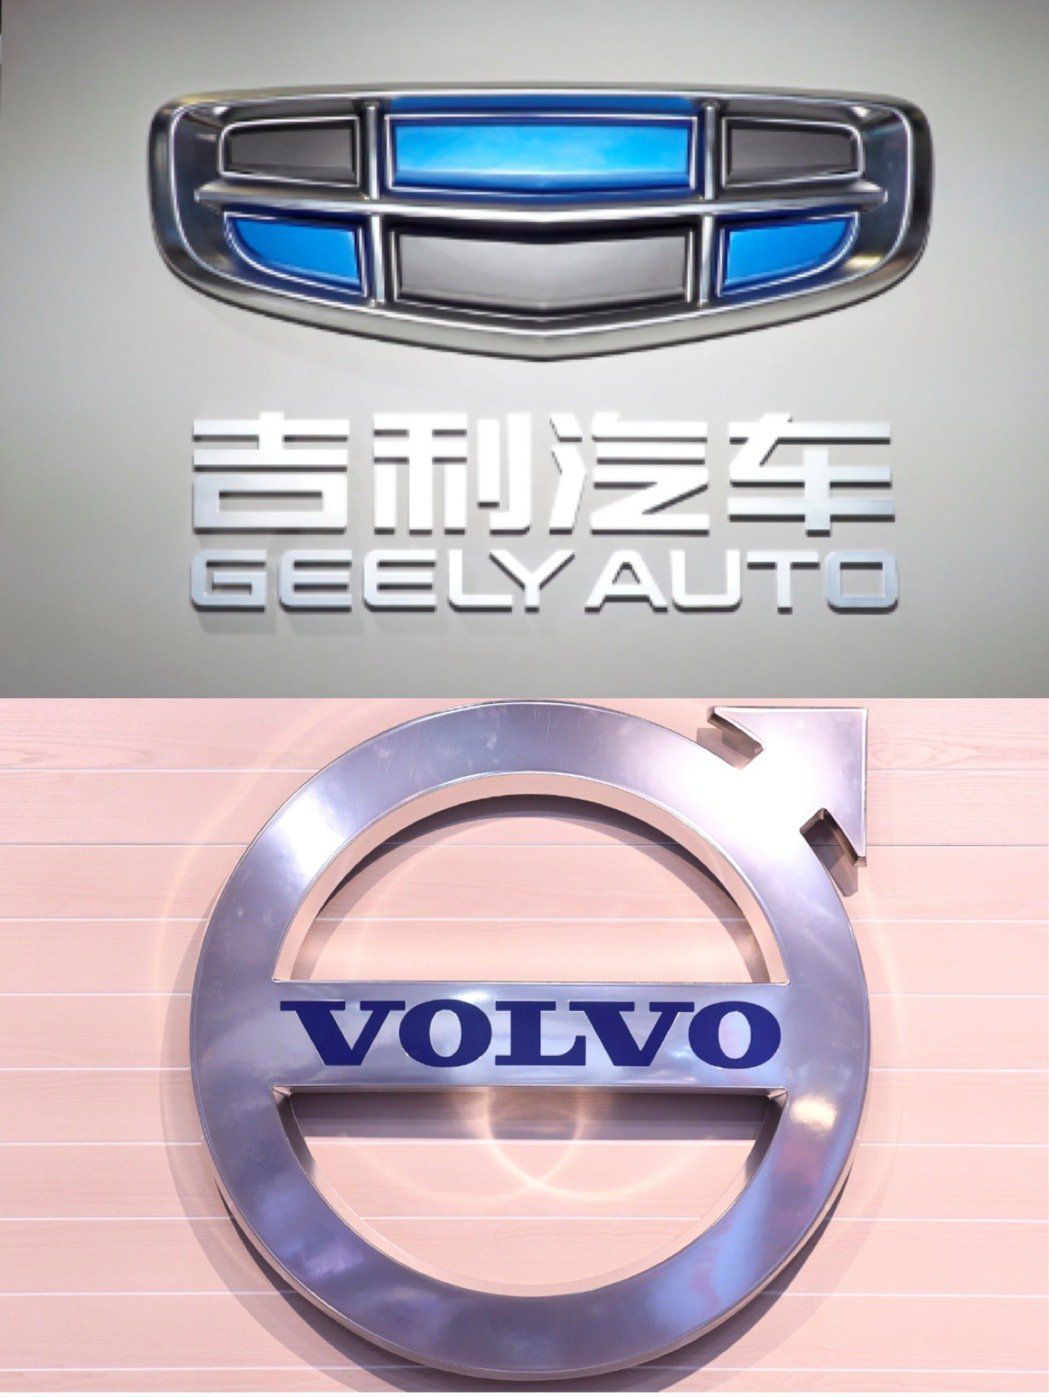 Volvo與大陸吉利汽車的動力系統業務將合併成立新公司,但兩家公司仍將保持各自獨...